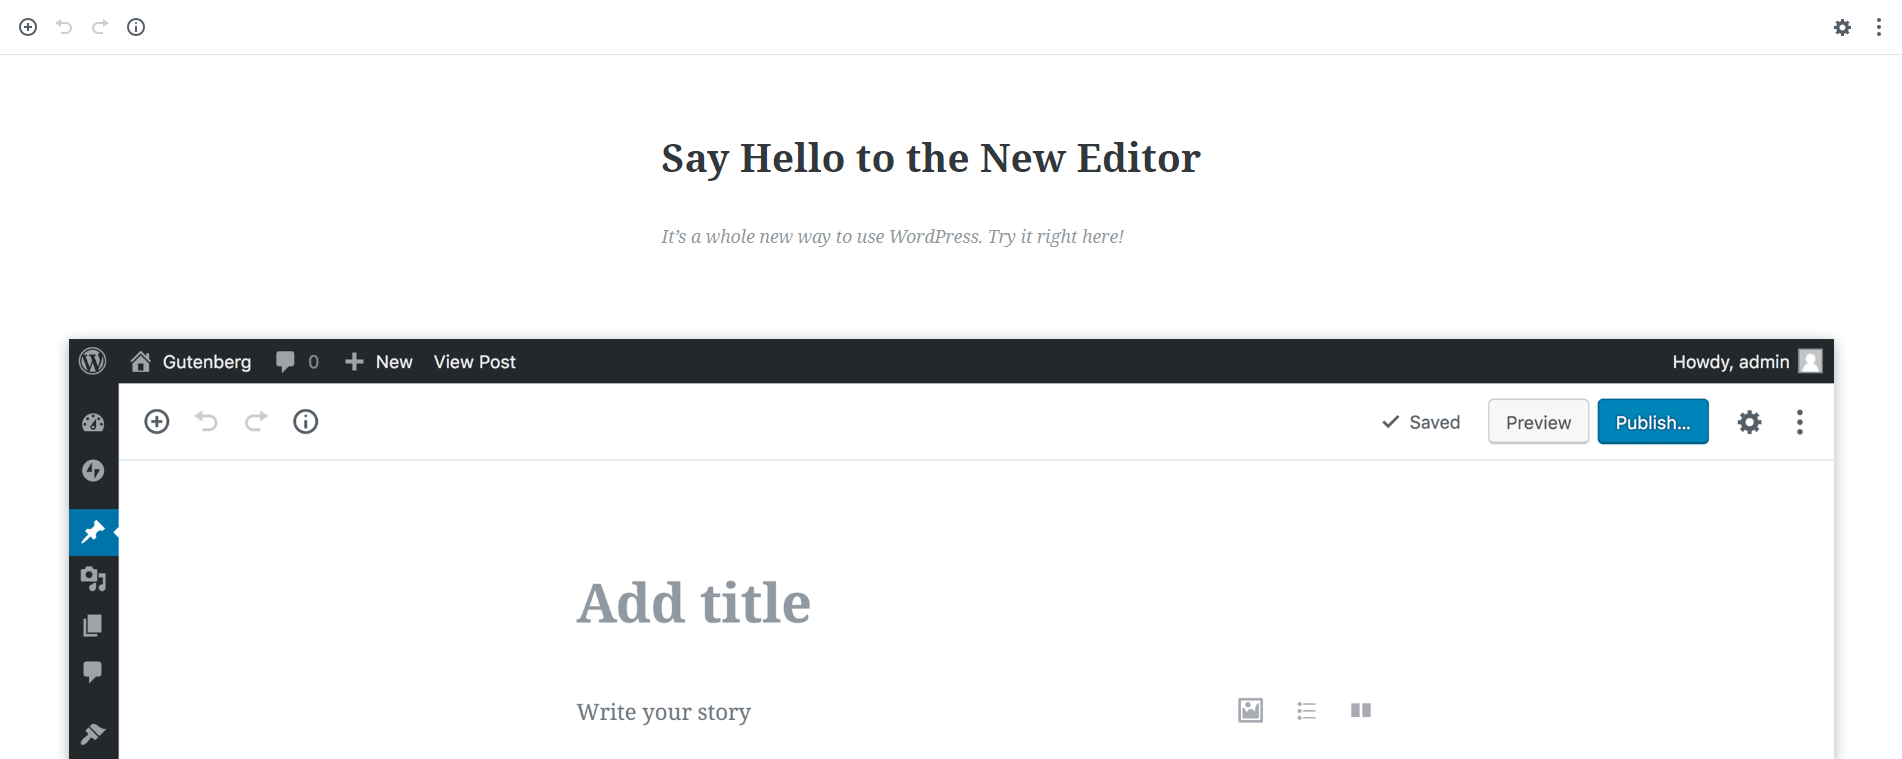 The project Gutenberg website.